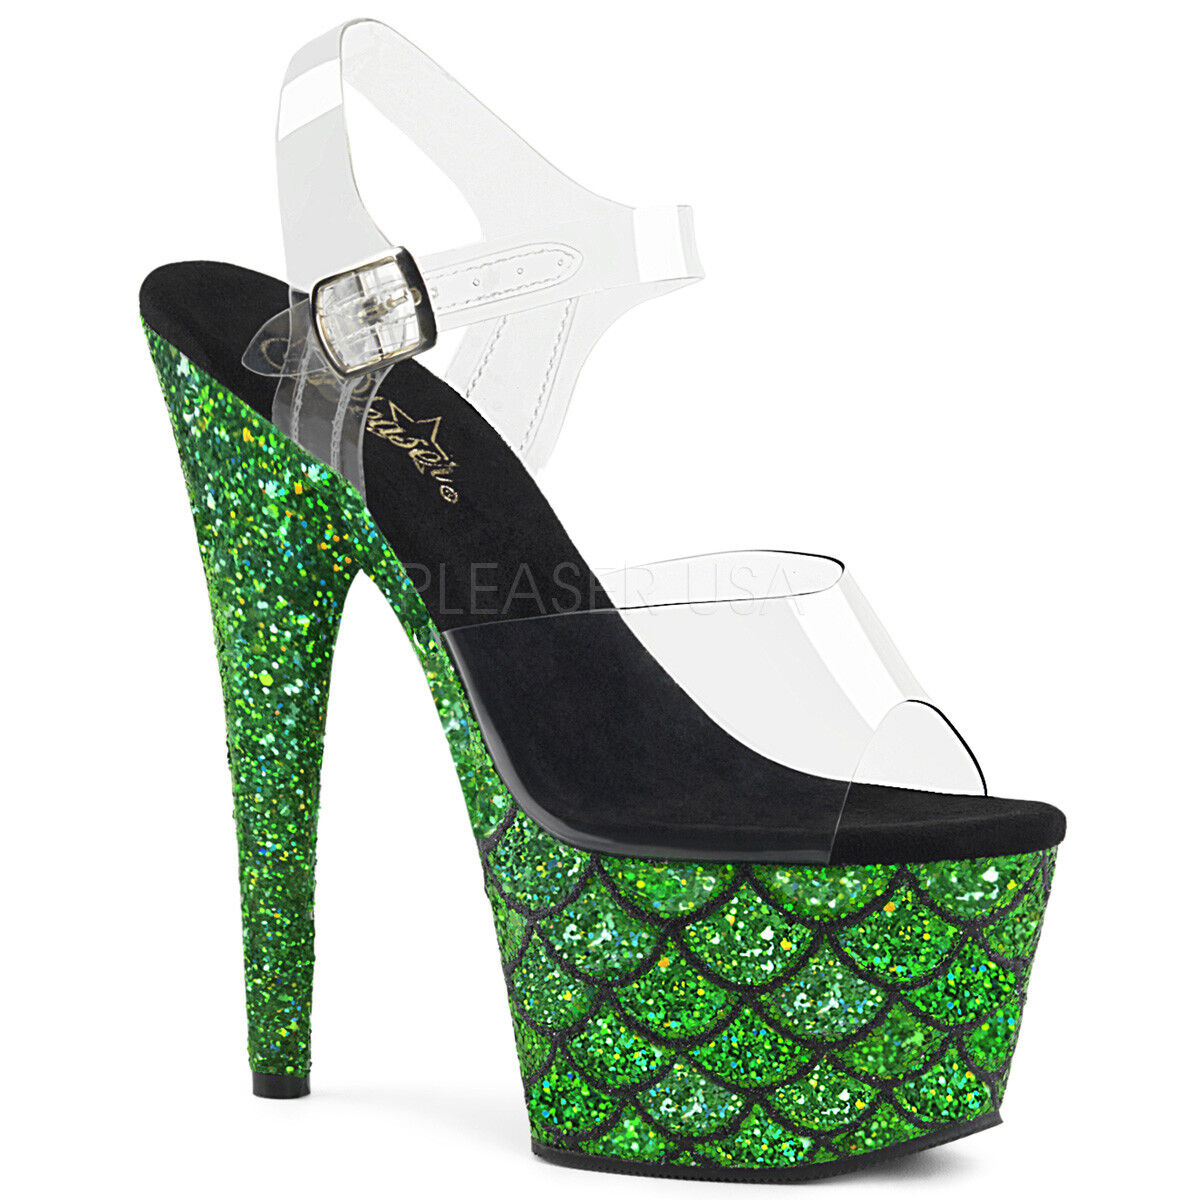 PLEASER 7  Heel Green Green Green Glitter Mermaid Platform Ankle Strap Stripper shoes ca2c33